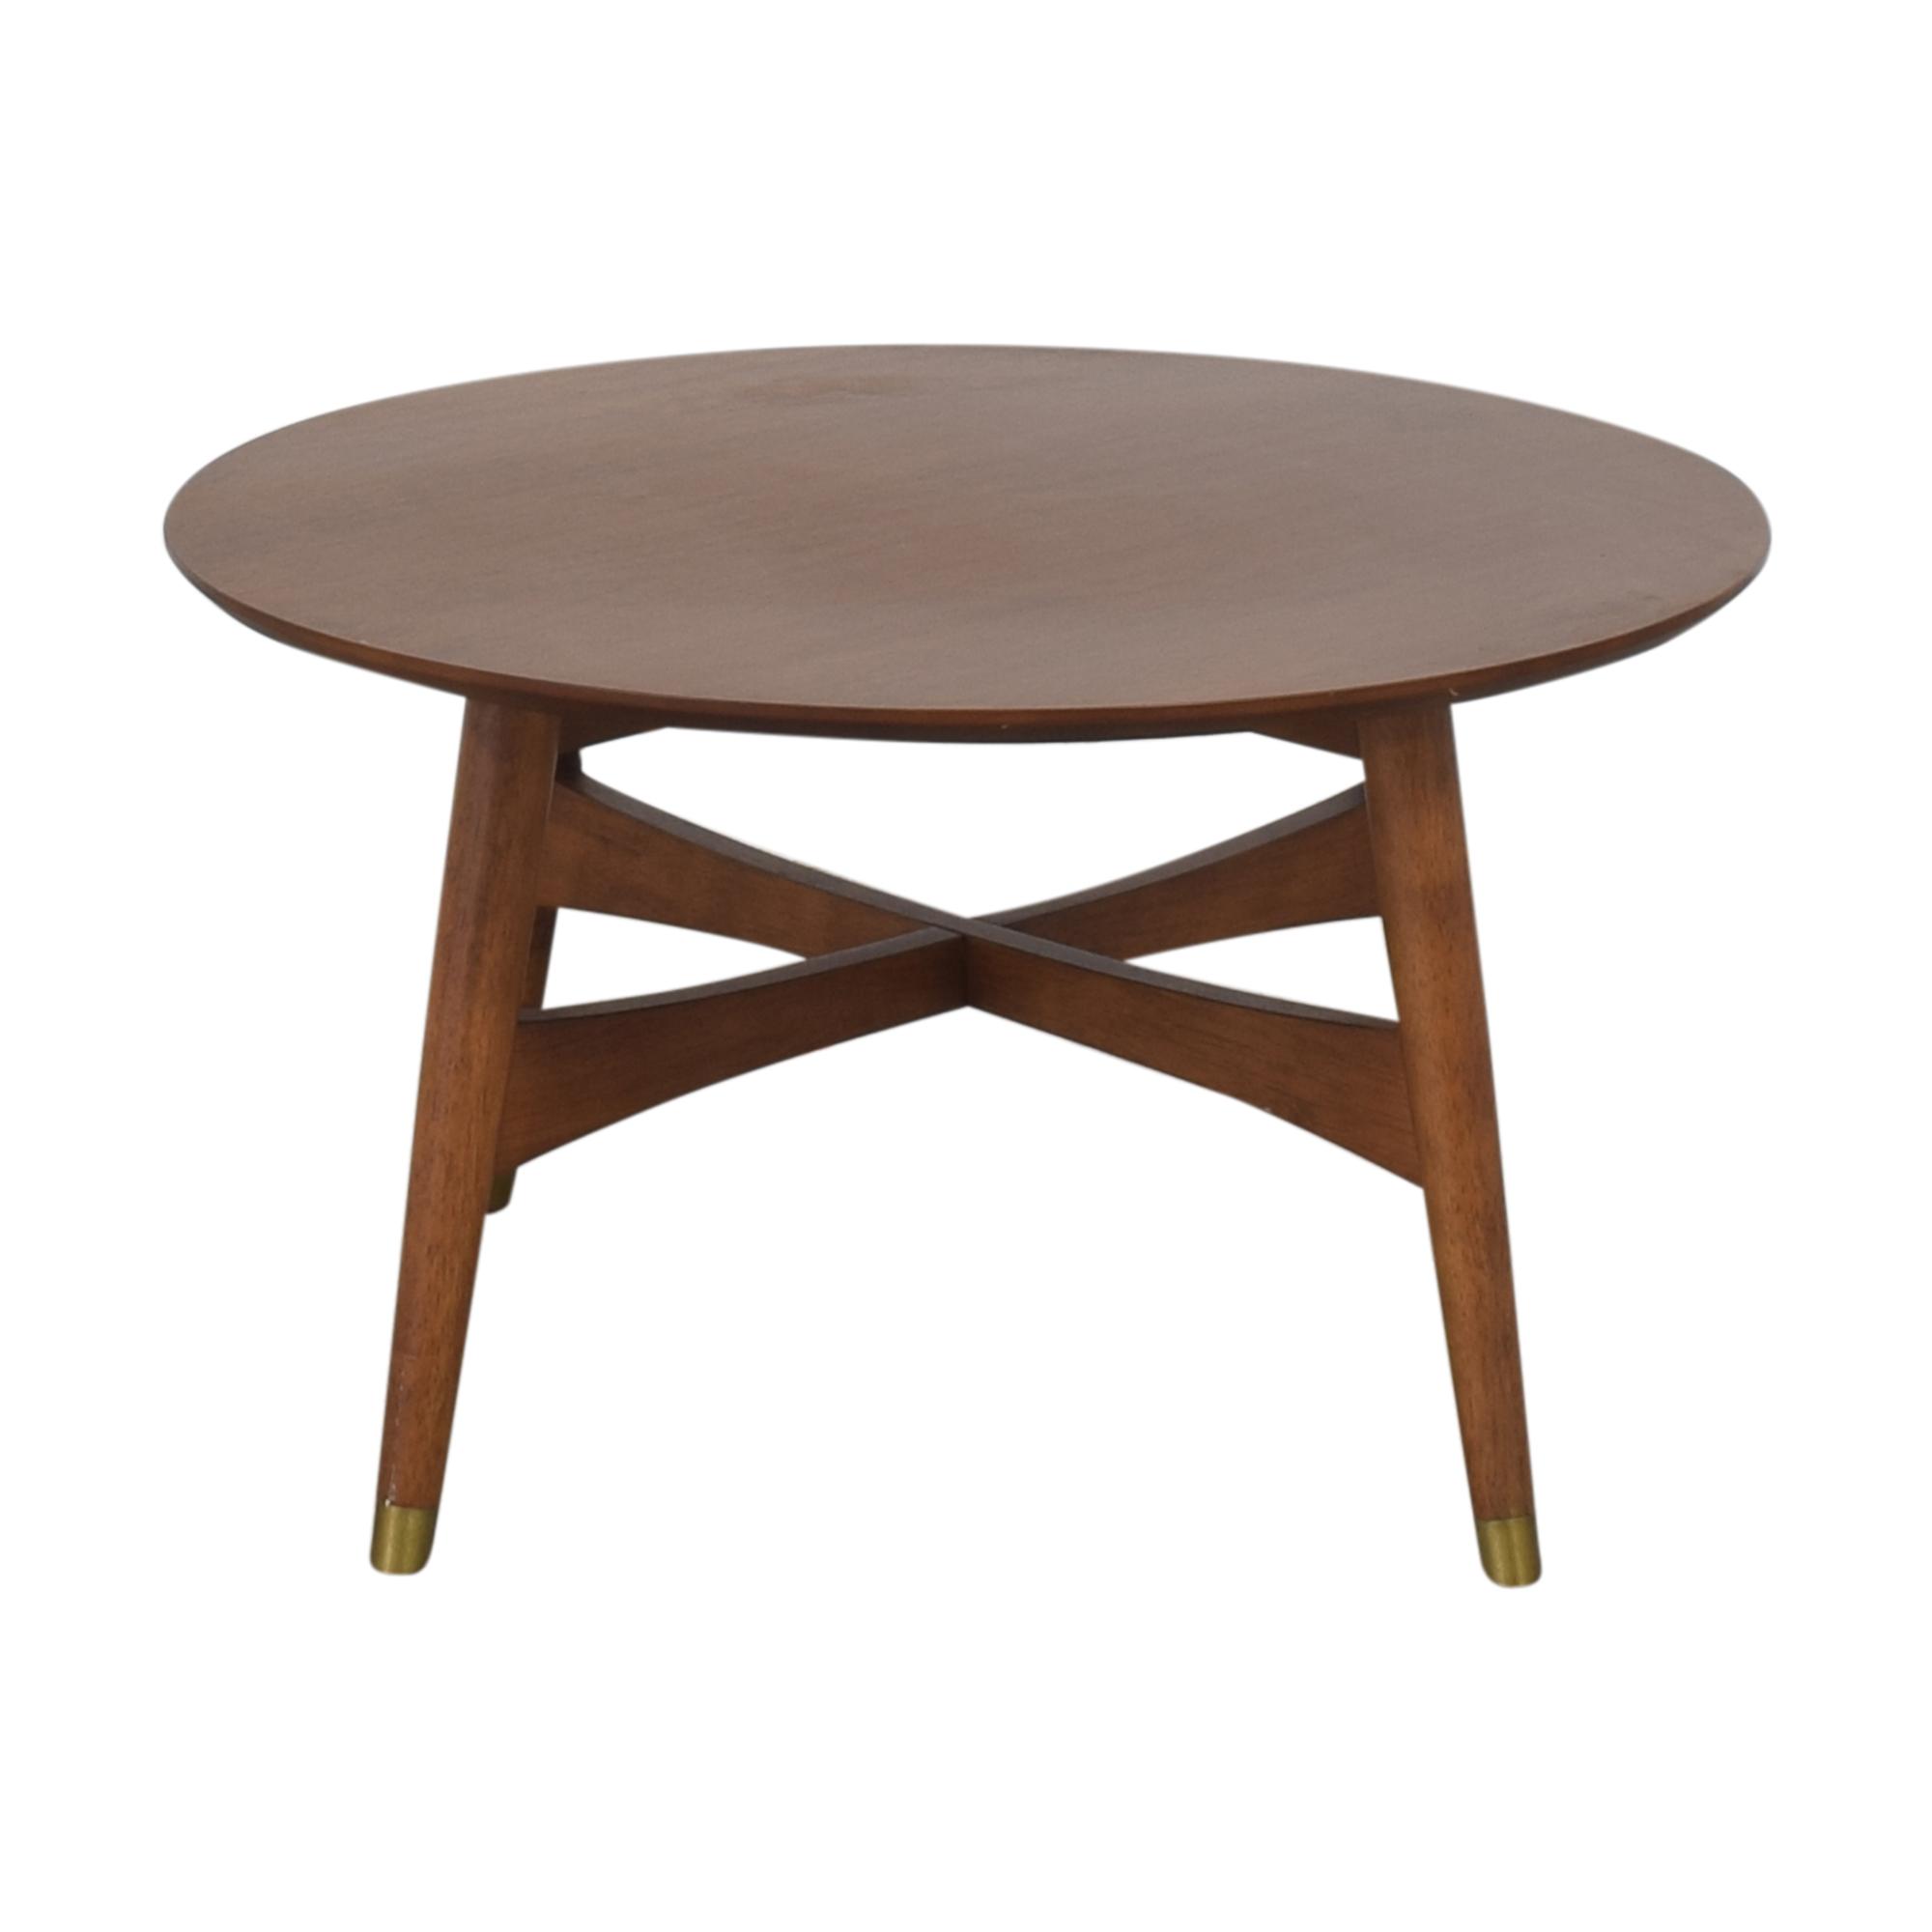 West Elm West Elm Reeve Mid-Century Coffee Table nyc